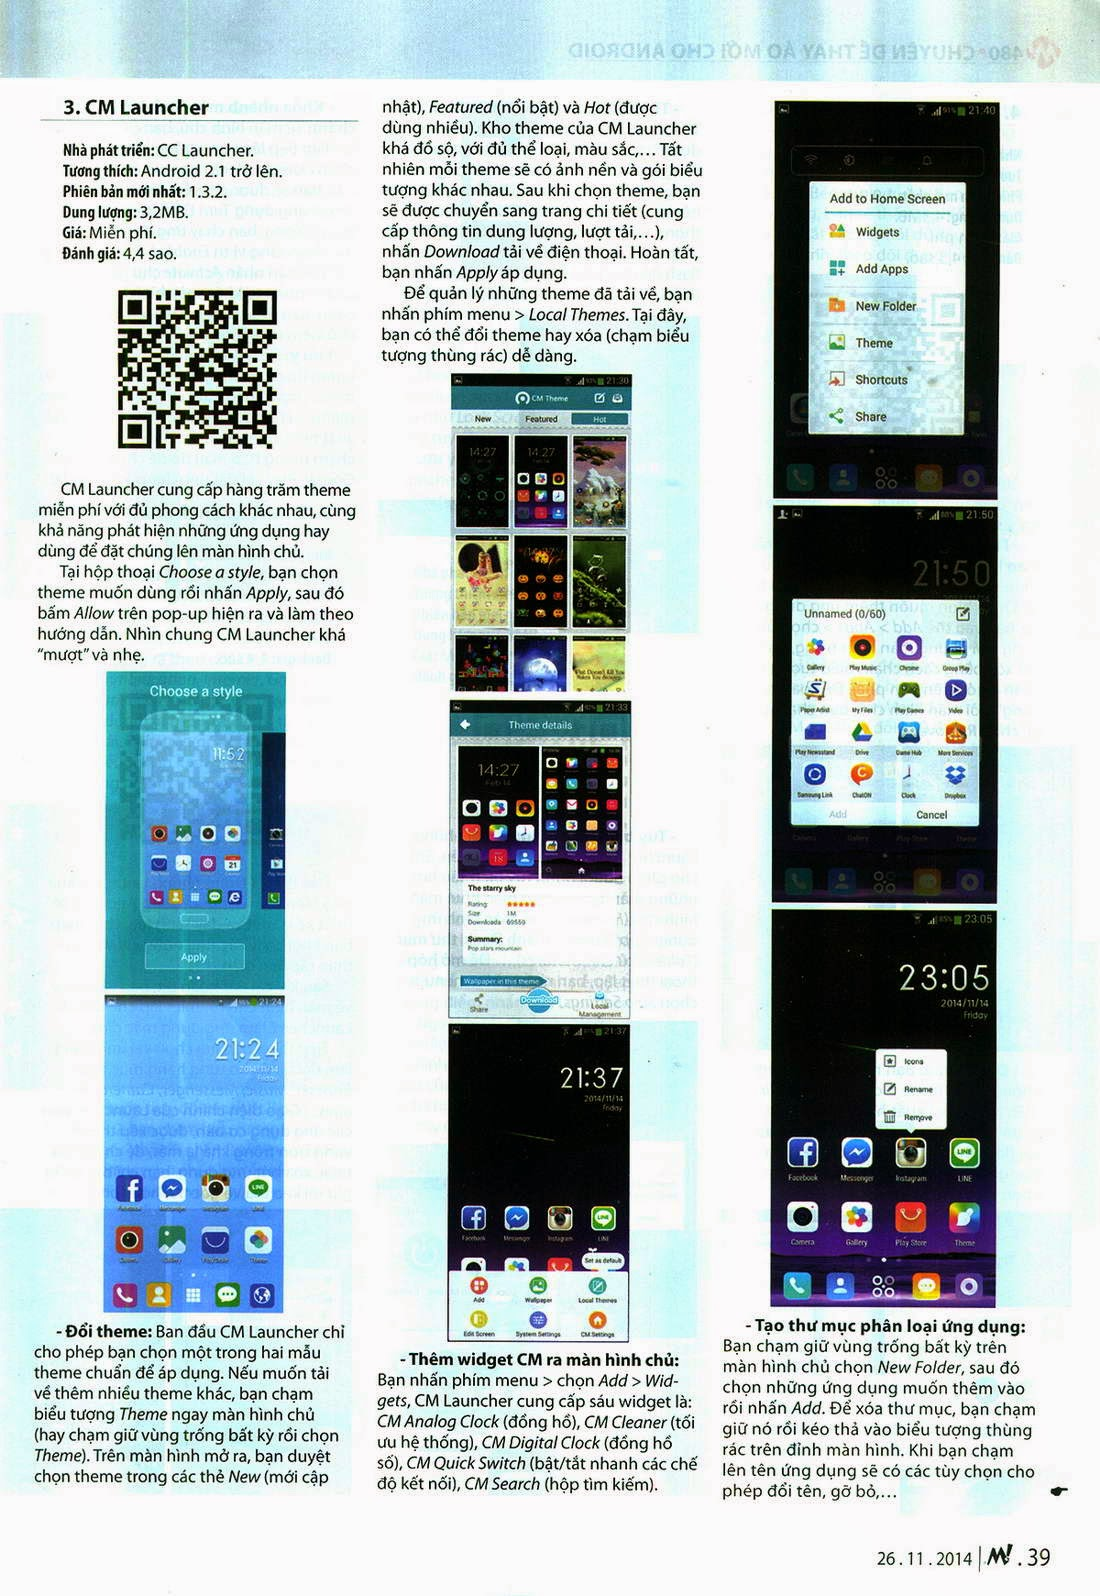 EChip Mobile 480 tapchicntt.com